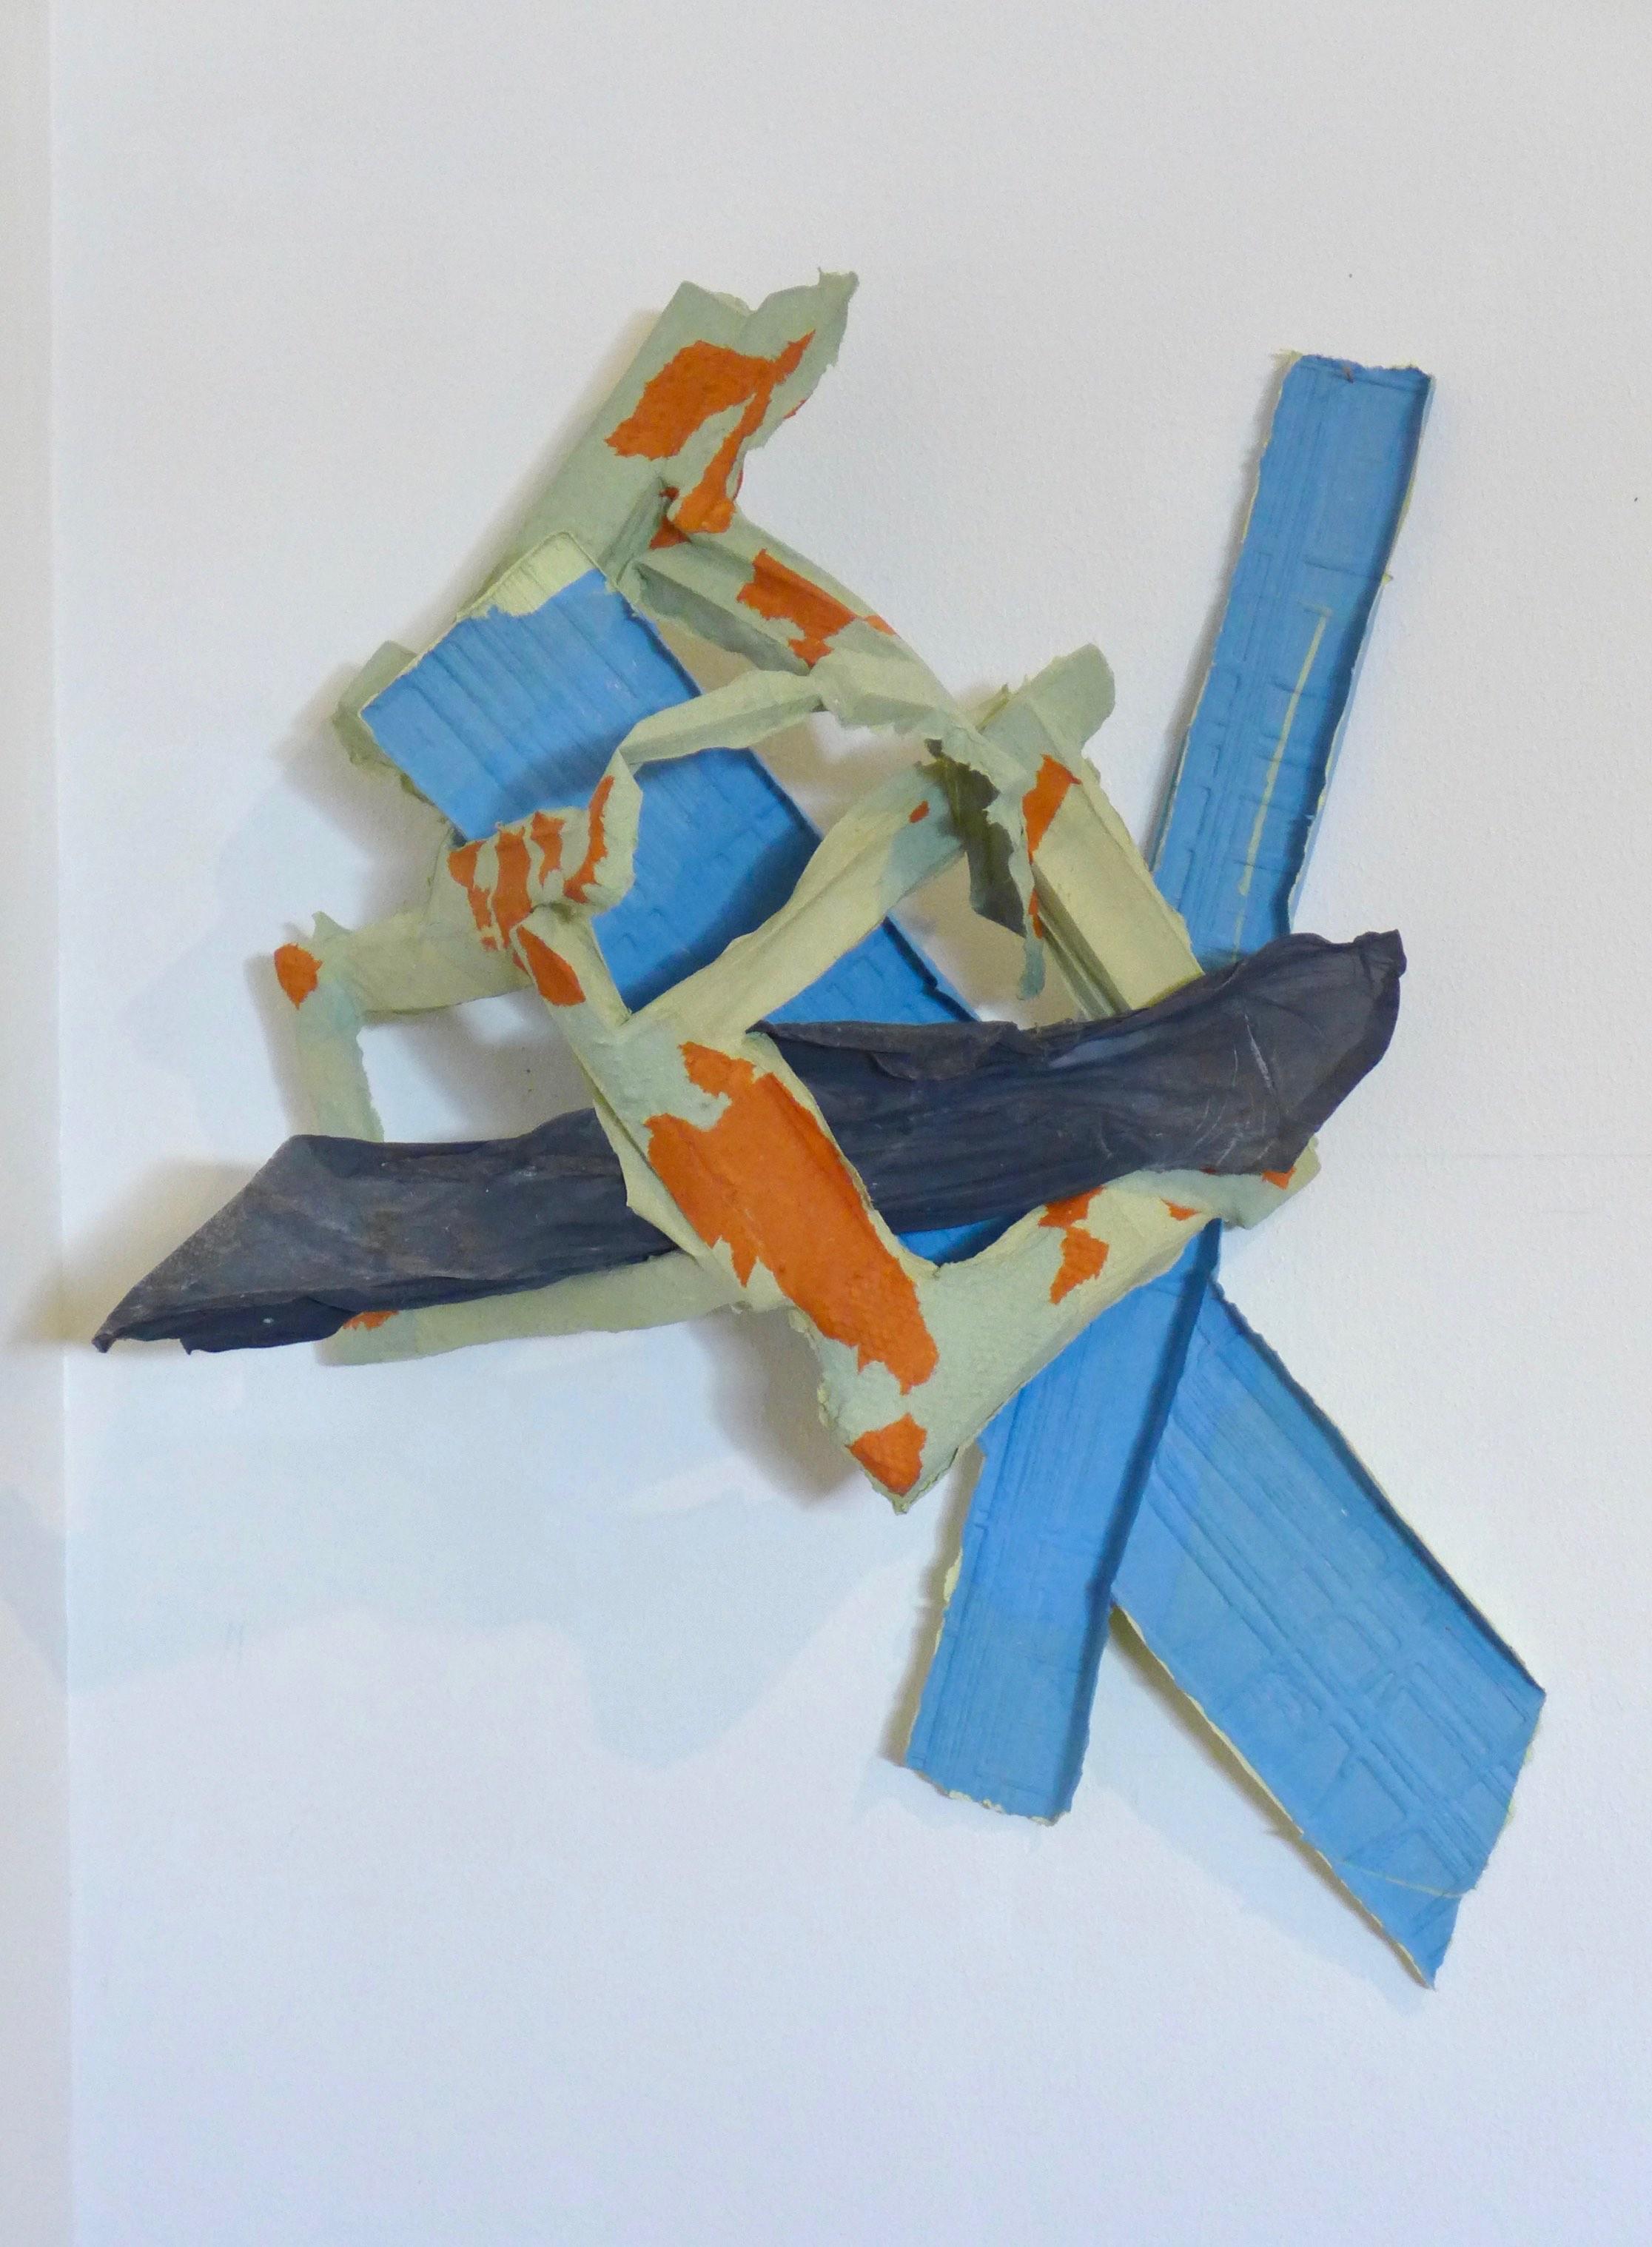 Barbara-Landes-cast-cotton-sculpture-paper-artwork.jpg